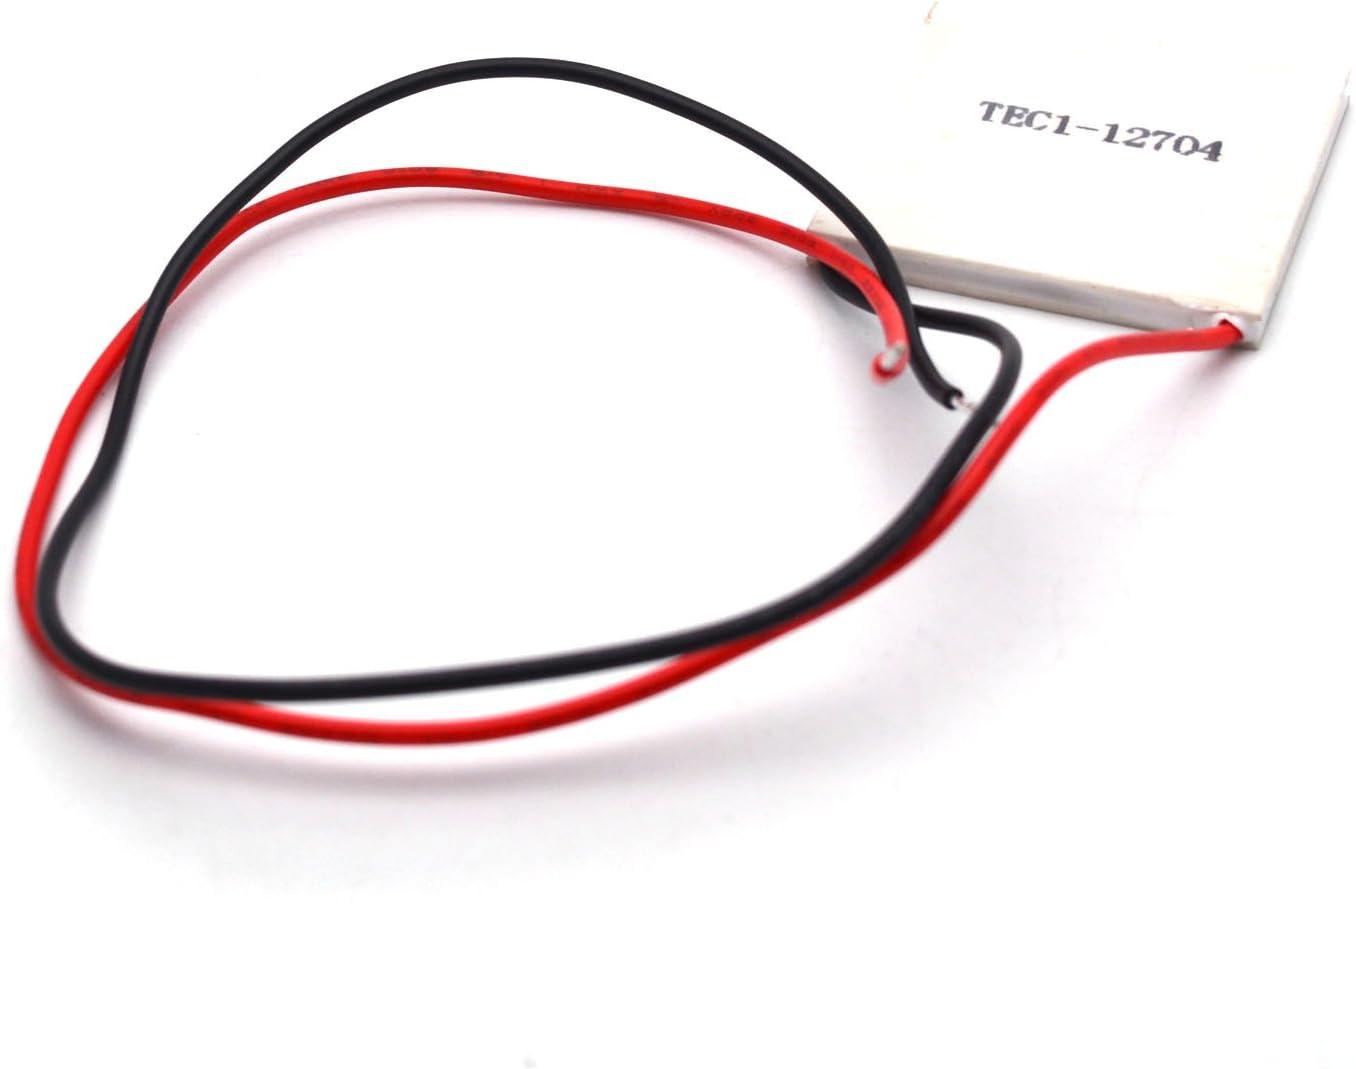 Antrader TEC1-12704 12V 36W Thermoelectric Peltier Cooler Heatsink Cooling Plate Module